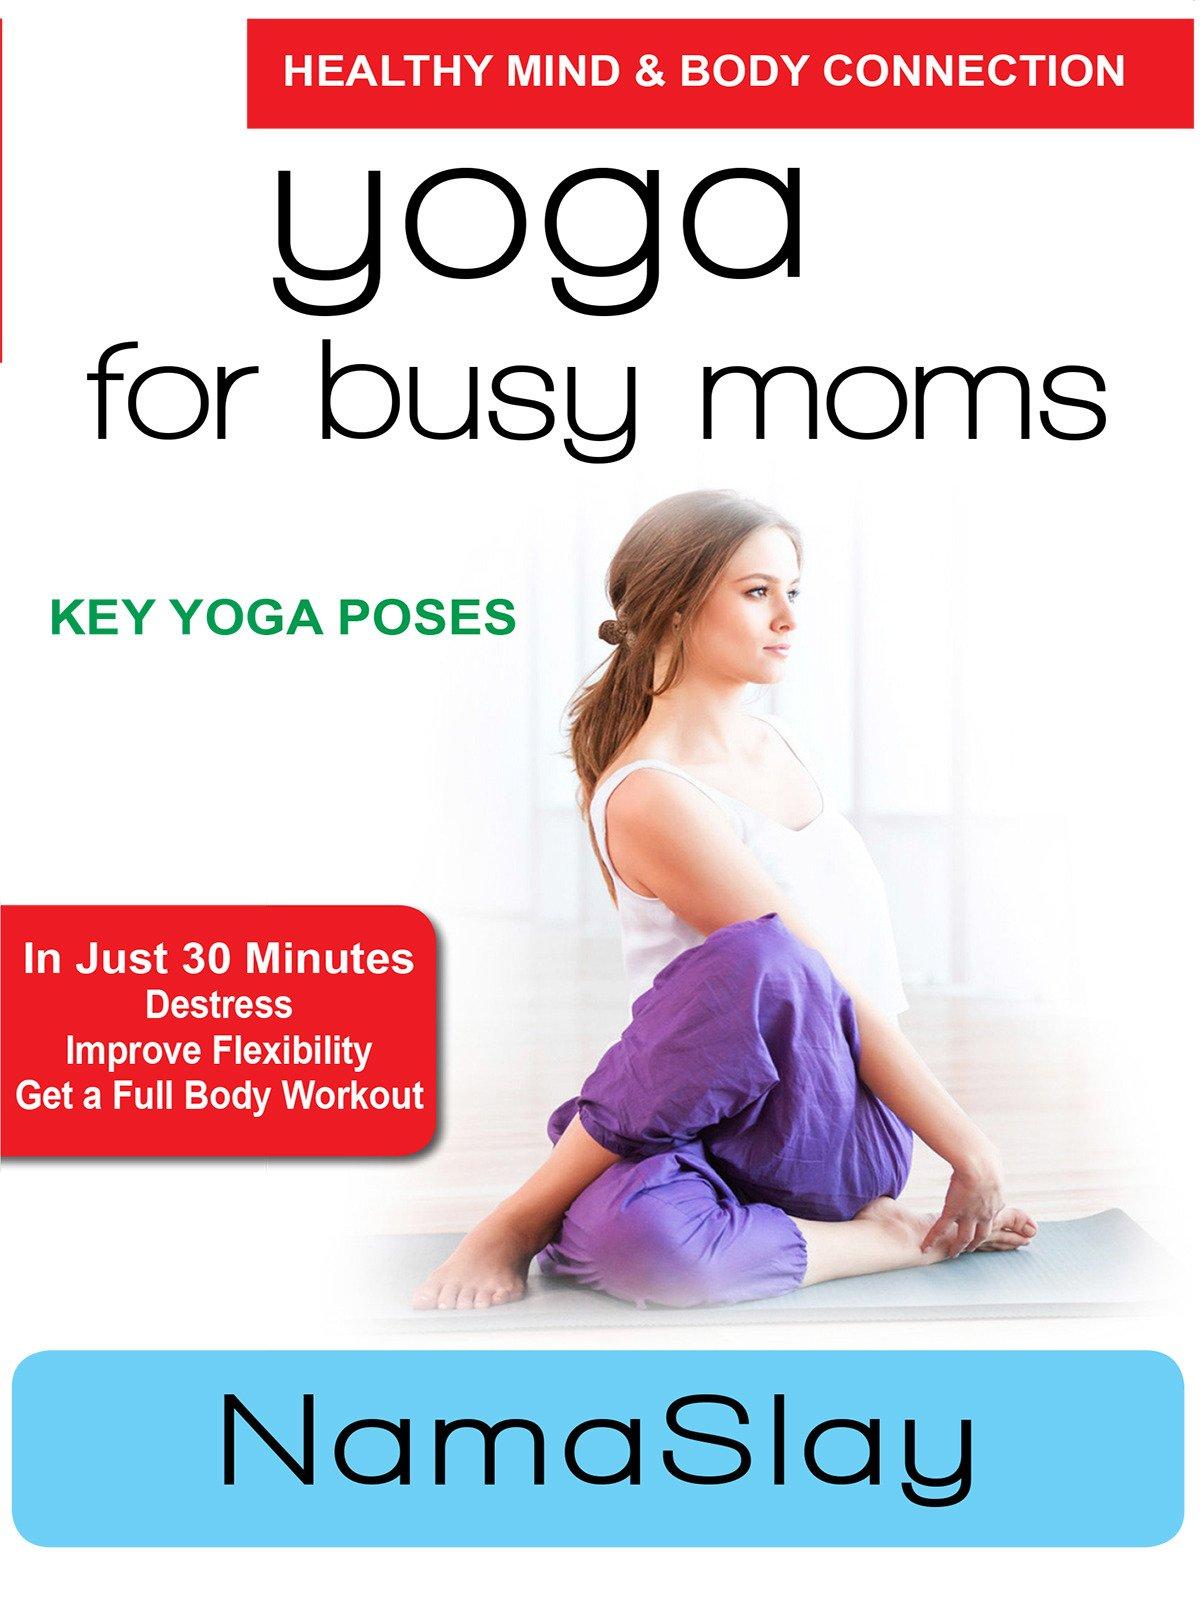 Yoga for Busy Moms - NamaSlay - Key Yoga Poses by